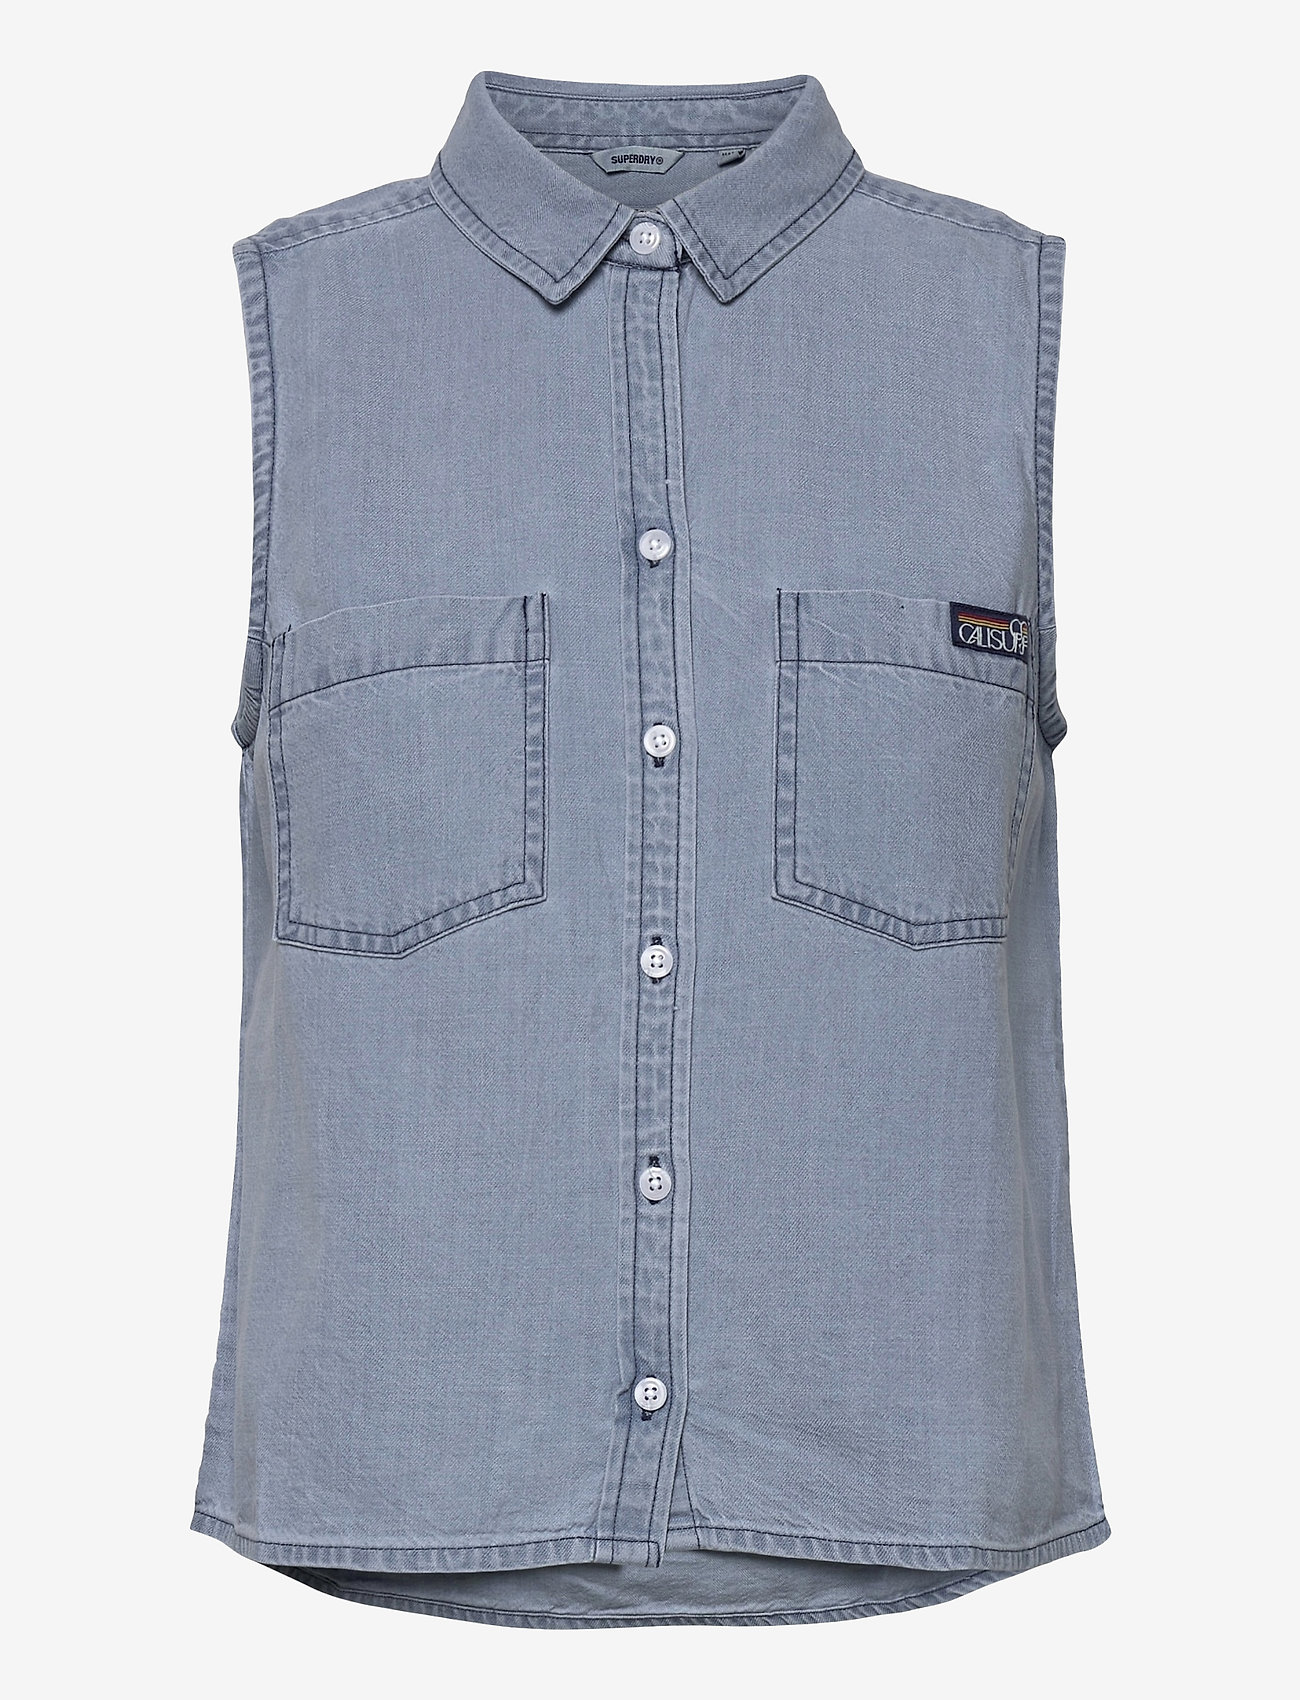 Superdry - SLEEVELESS SHIRT - sleeveless blouses - light wash - 0